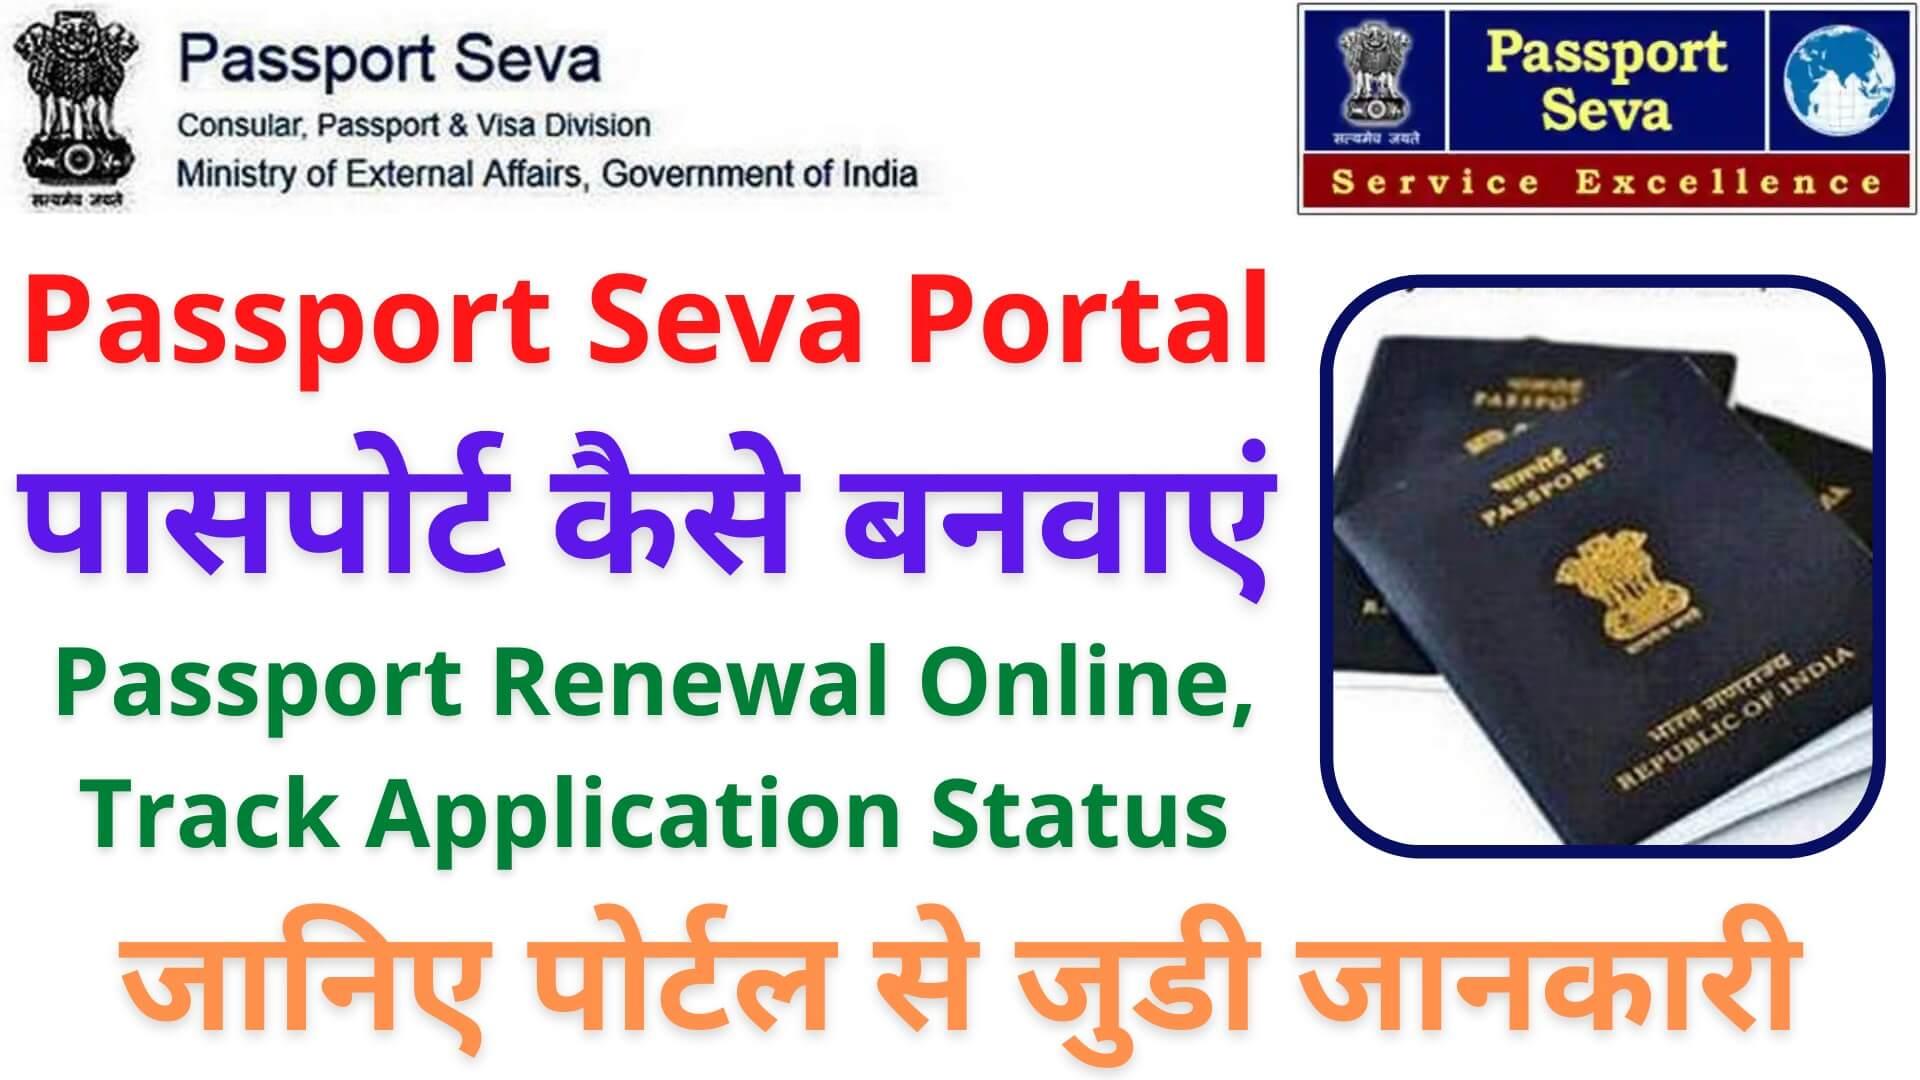 Passport Seva Portal